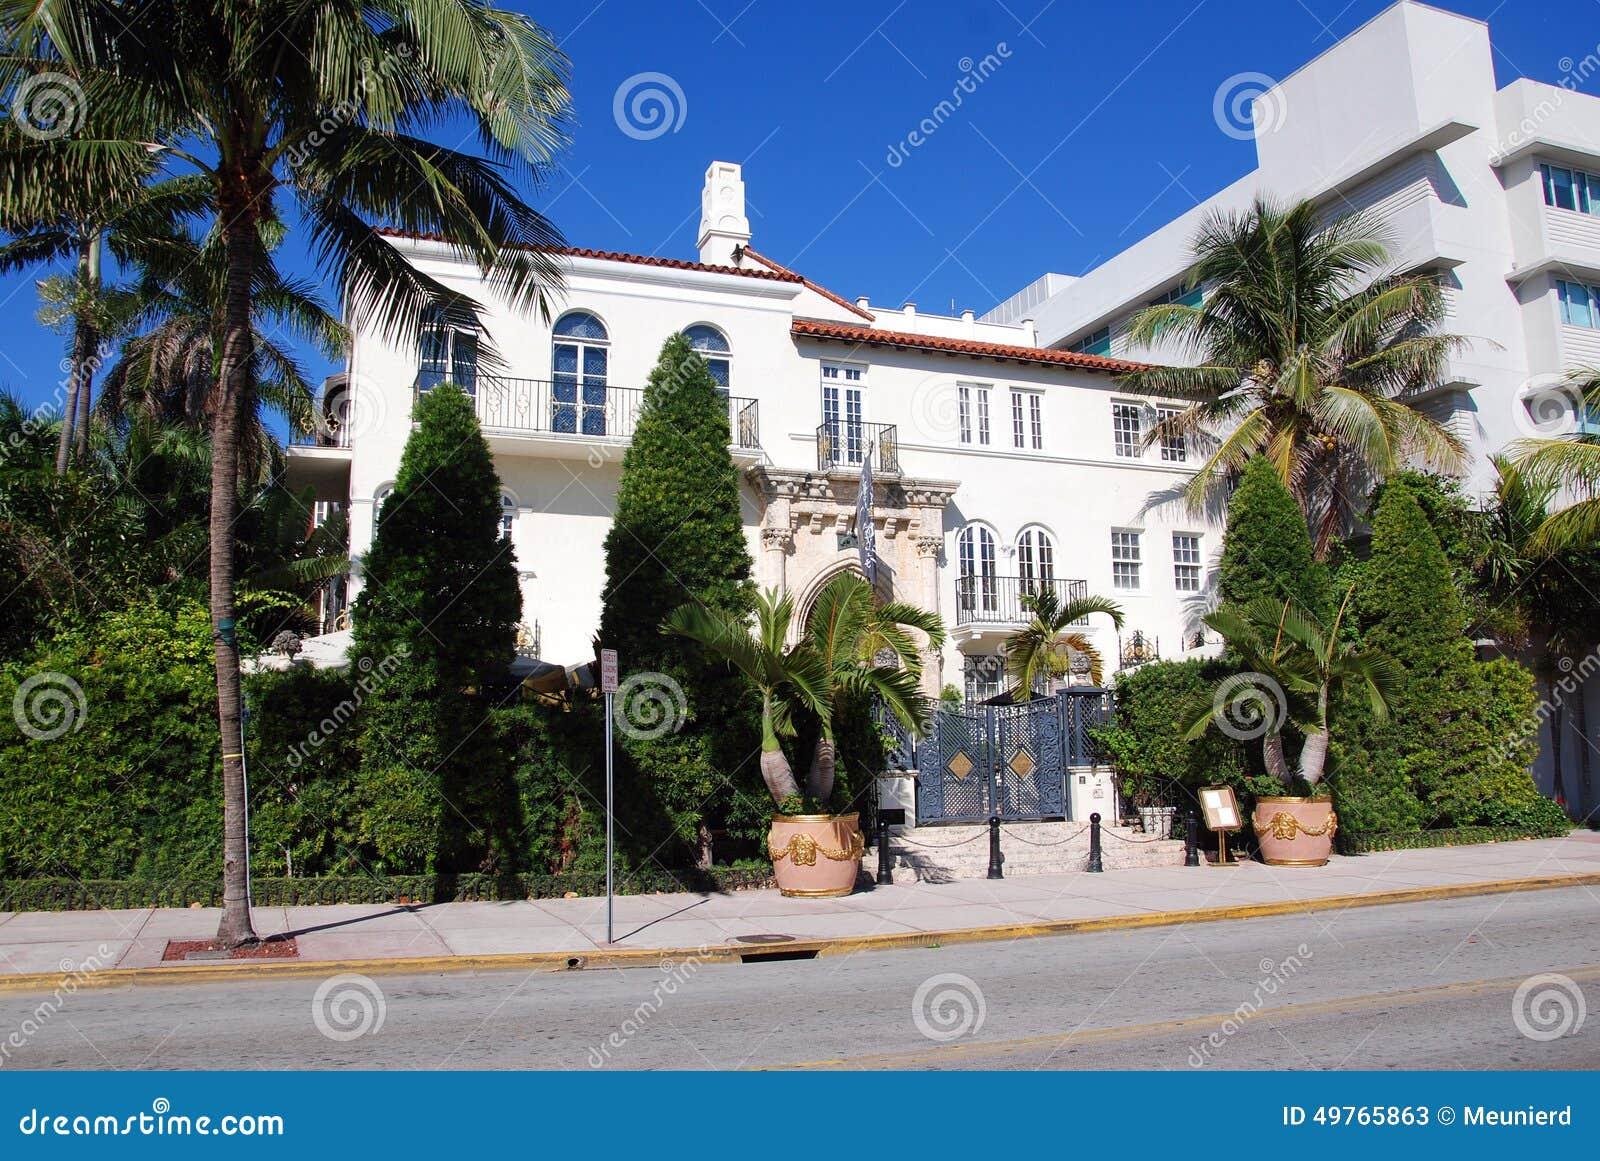 Miami South Beach Versace Mansion